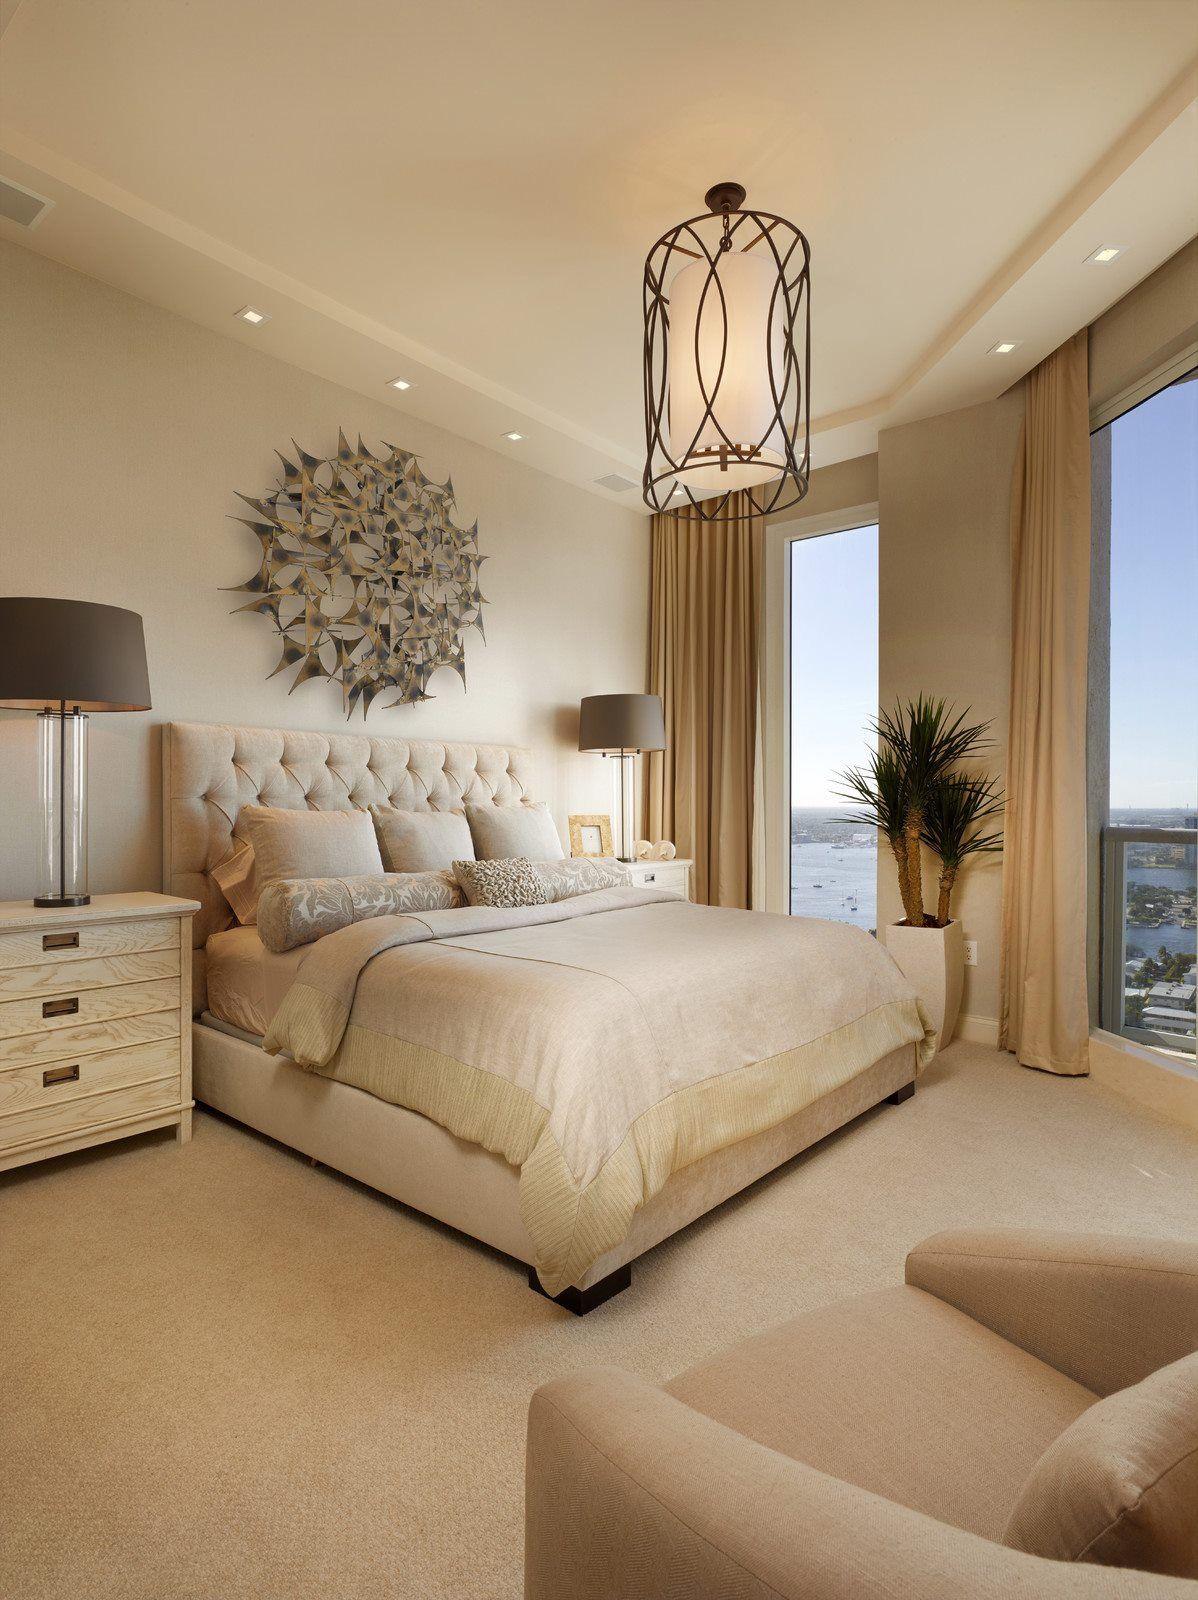 Bedroom Hdb Furniture: Pin By Debbie McClymont On Master Bedroom